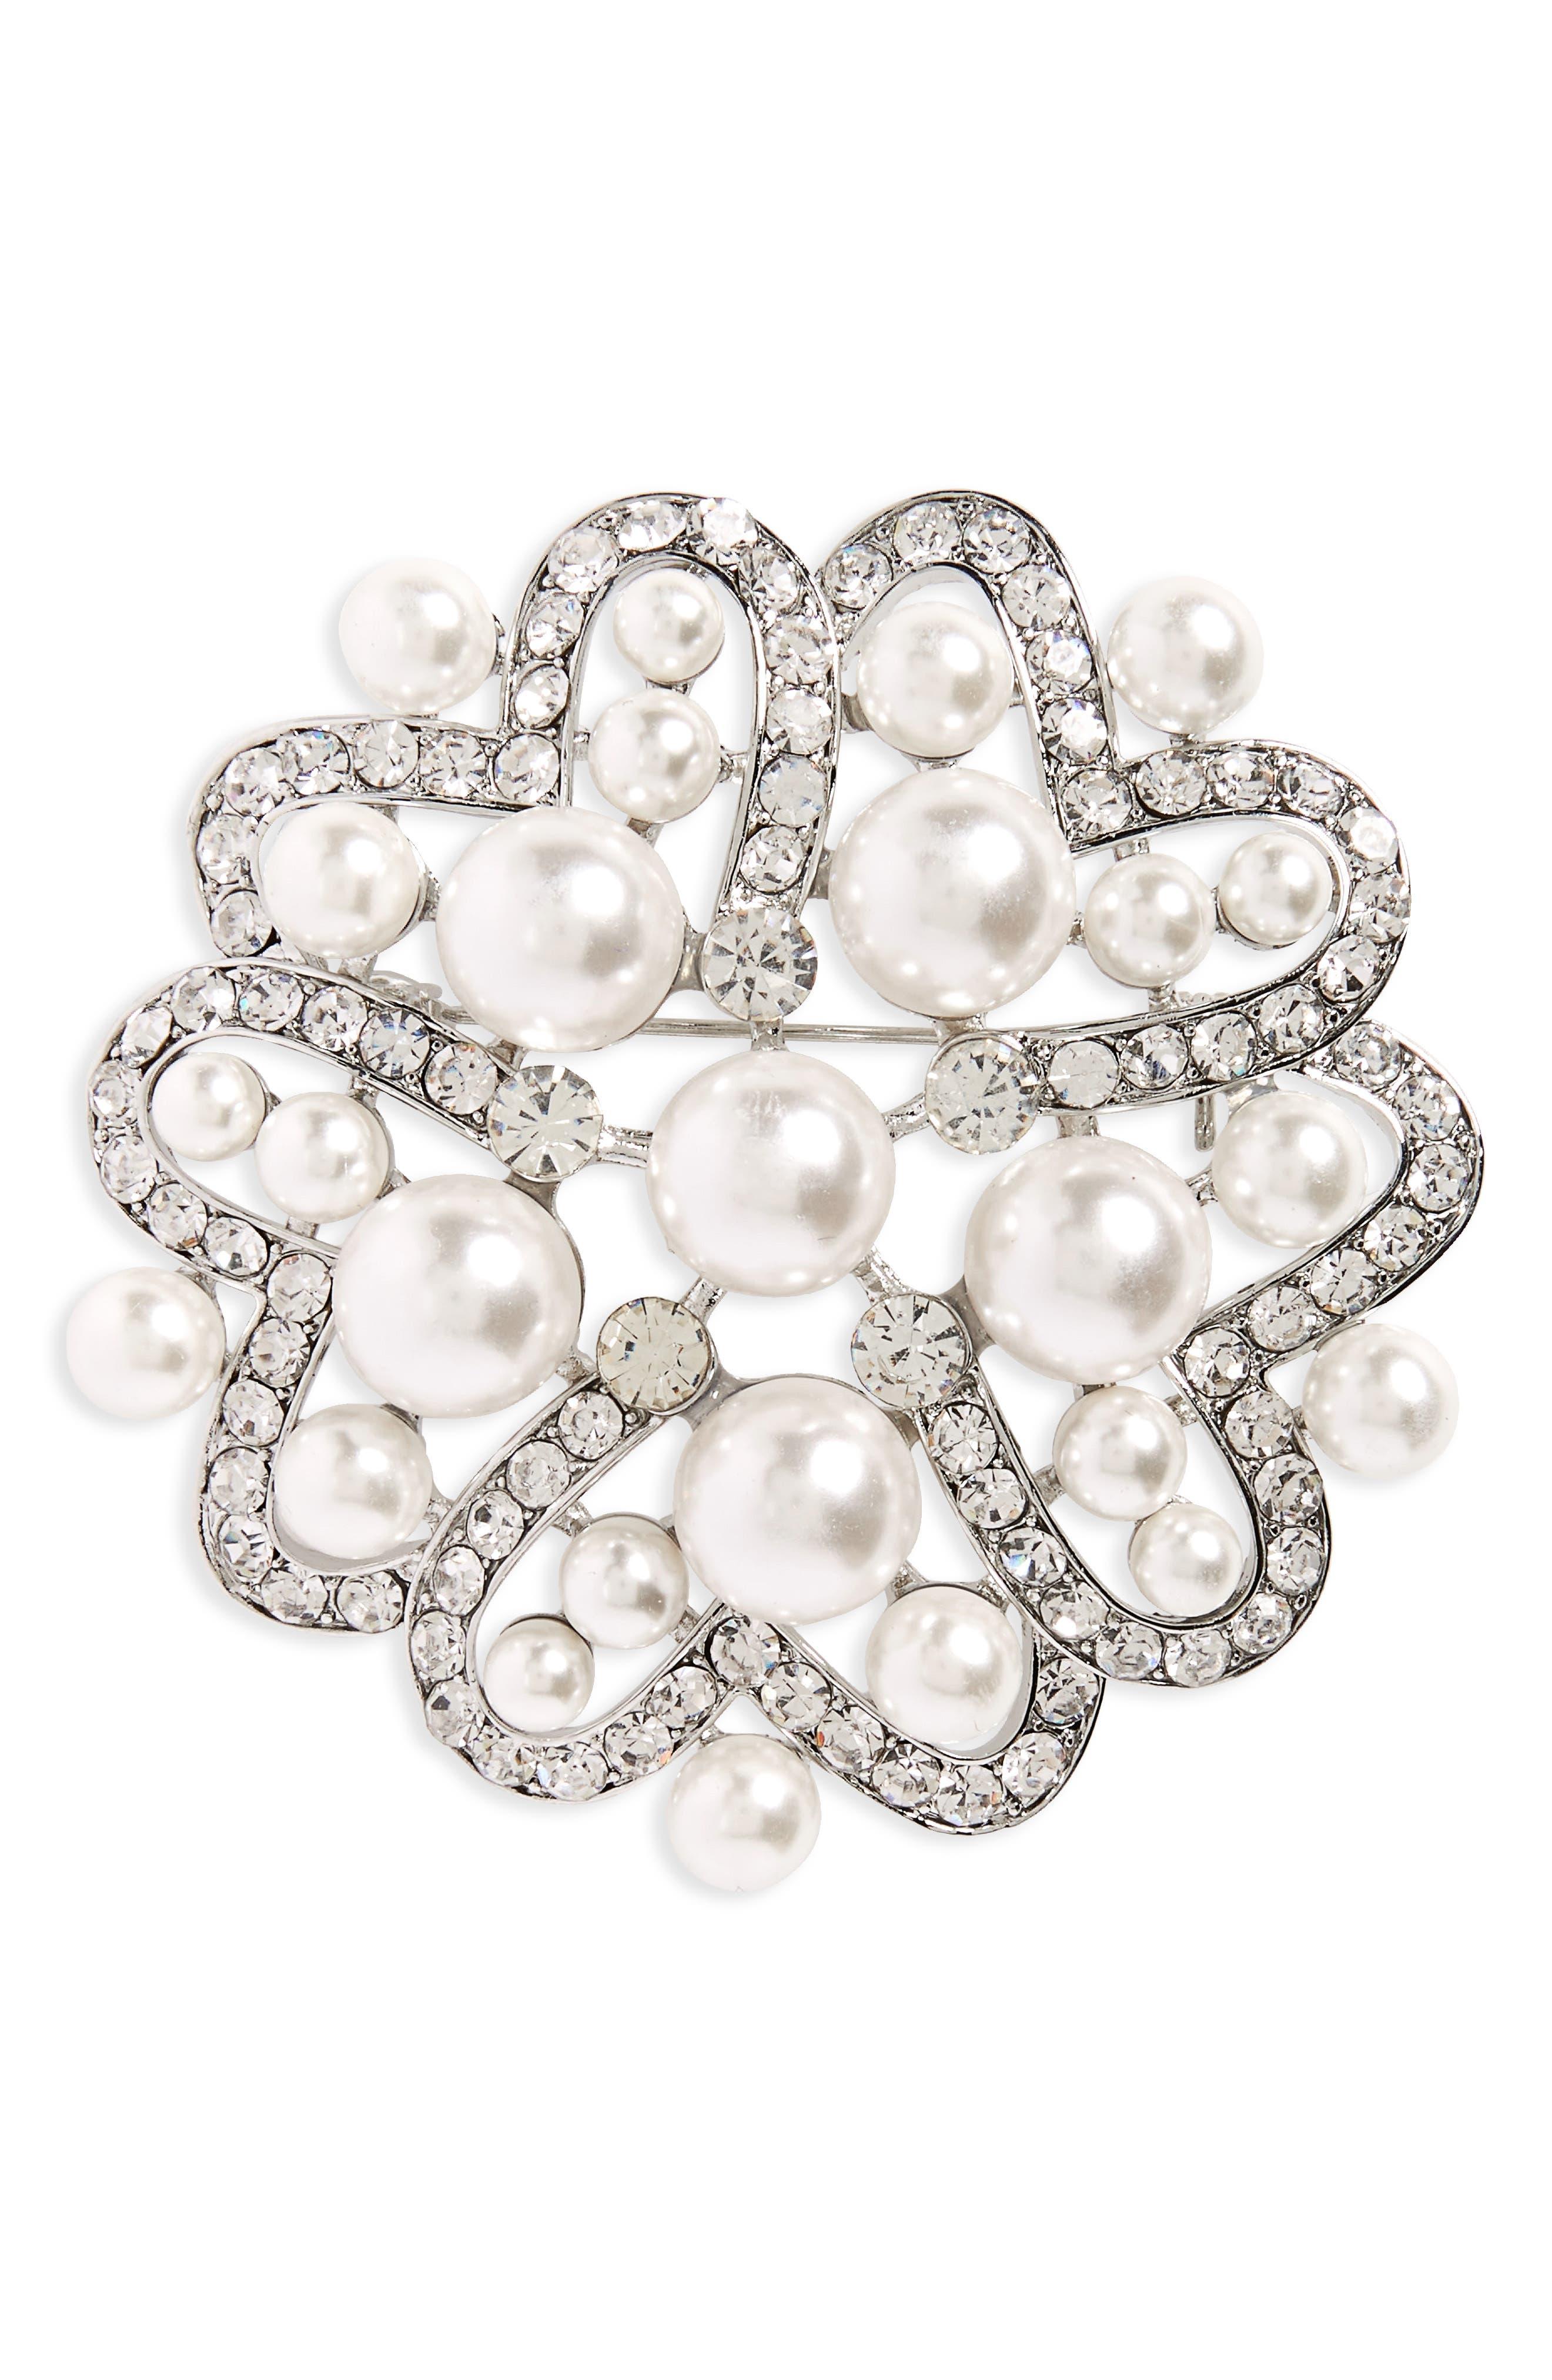 Imitation Pearl & Crystal Brooch,                         Main,                         color, Ivory Pearl / Silver